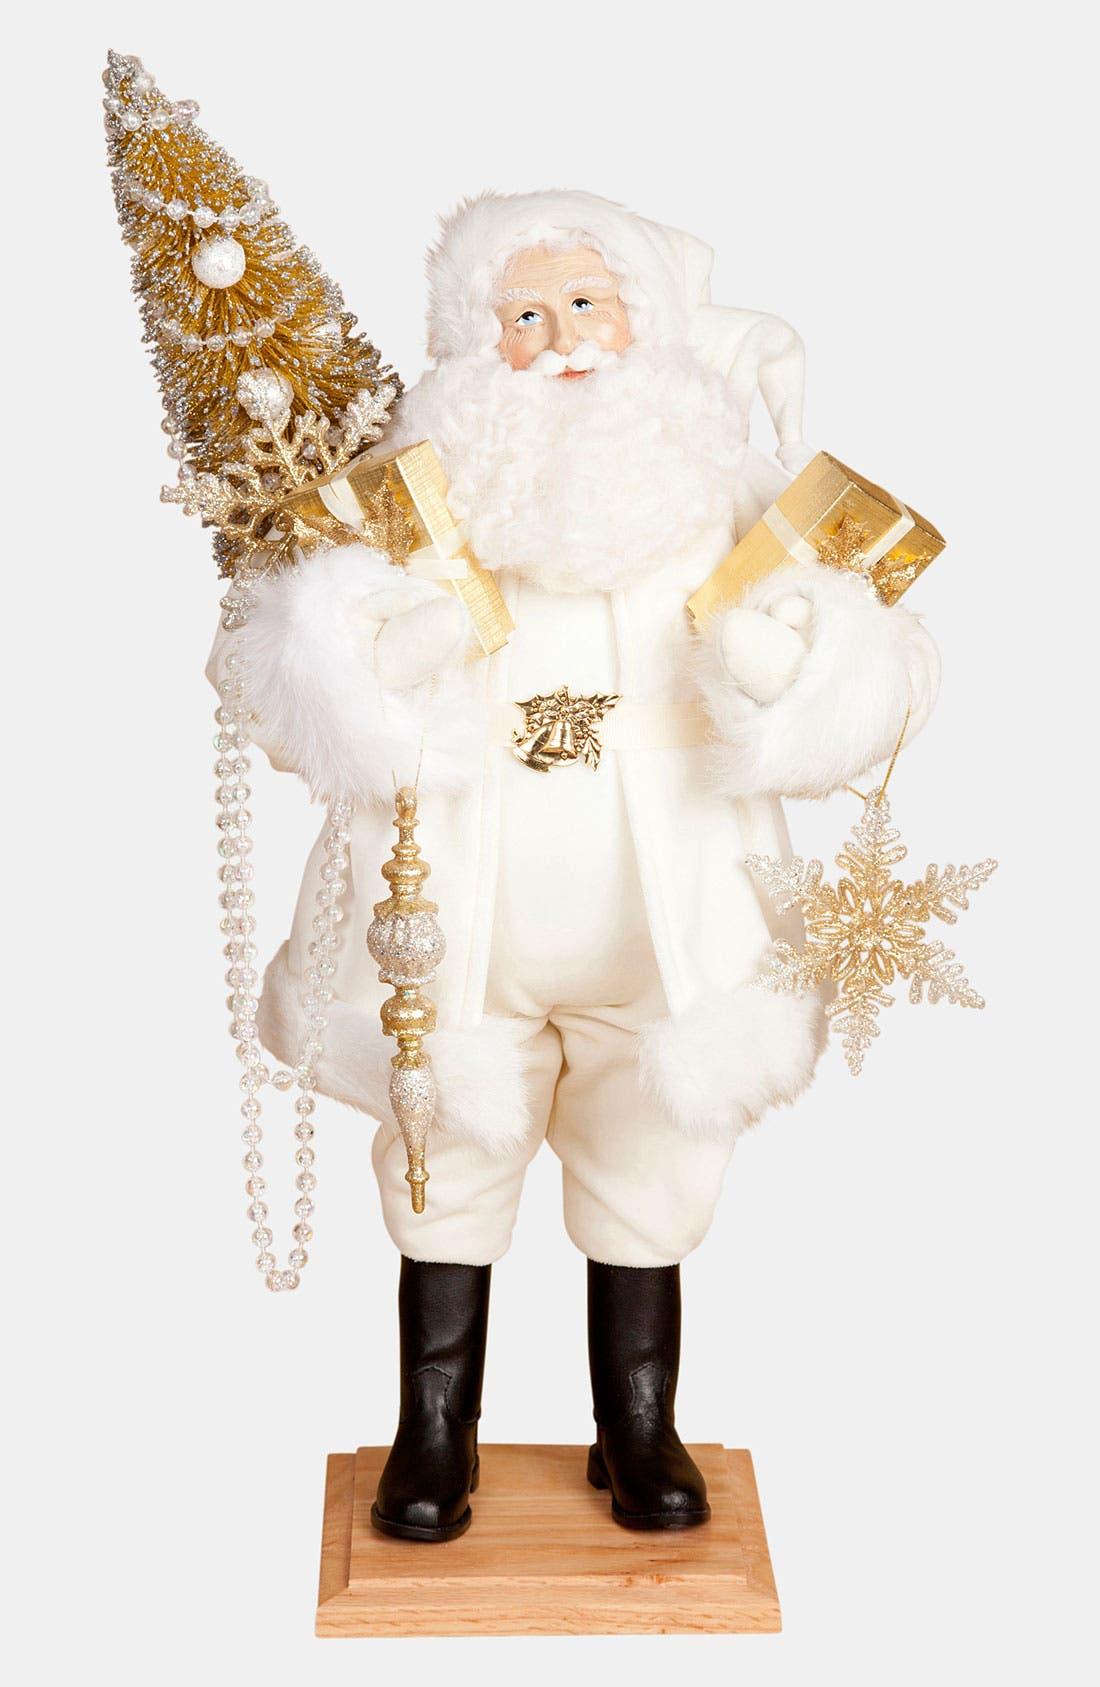 Alternate Image 1 Selected - Lynn Haney 'Winter's Touch' Santa Figurine